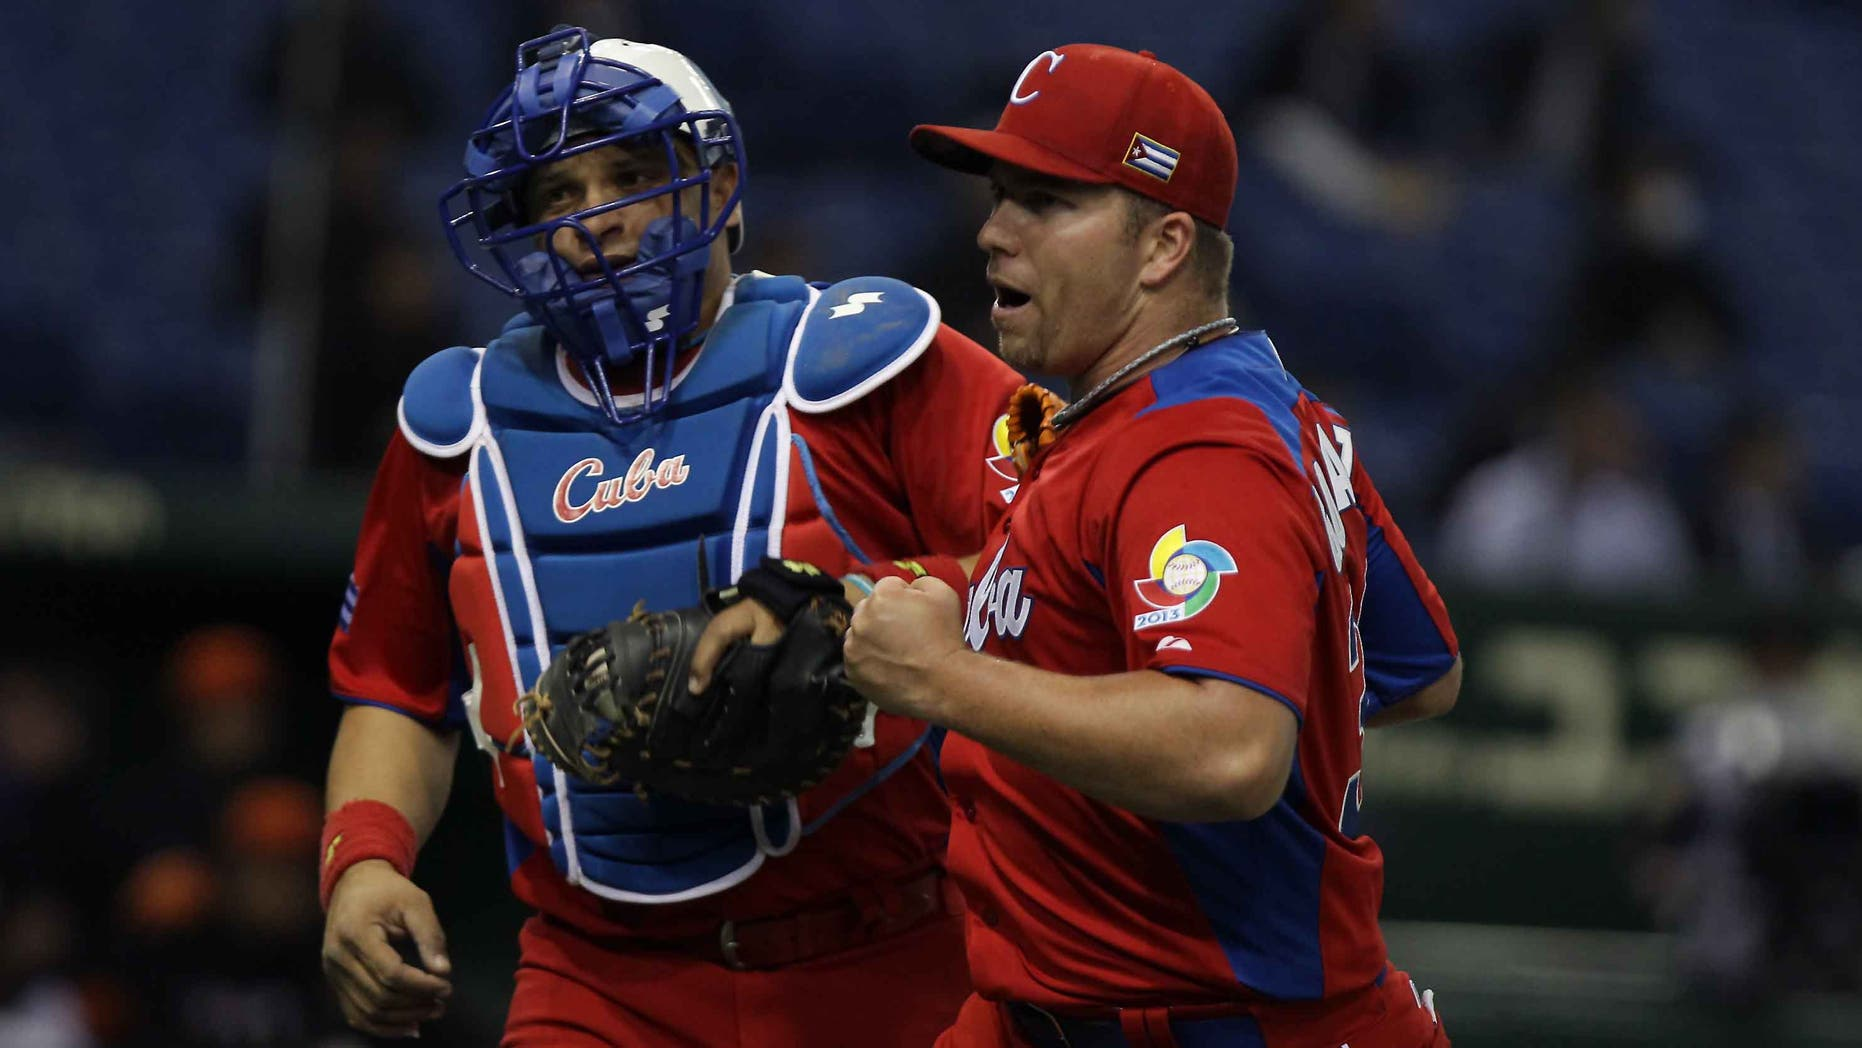 Pitcher Norberto Gonzalez and catcher Eriel Sanchez  of Cuba on March 11, 2013 in Tokyo, Japan.